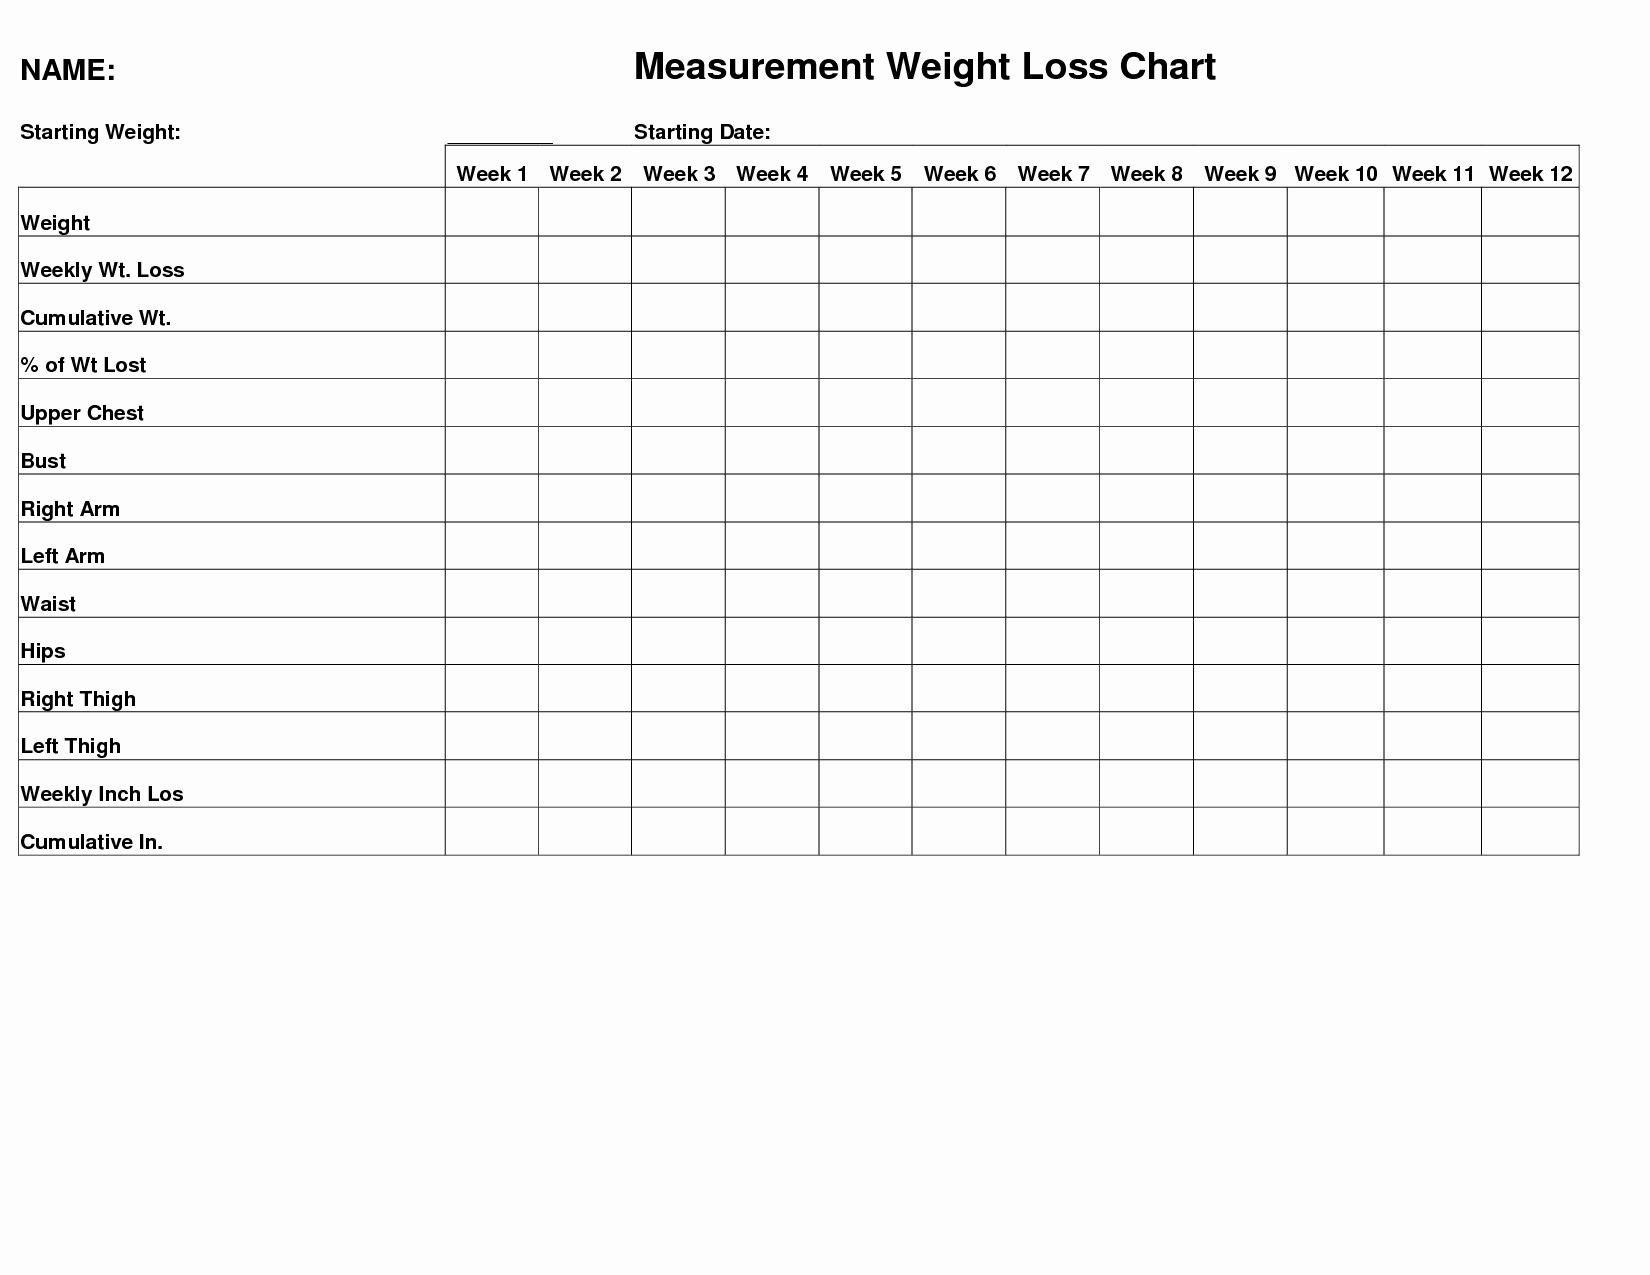 Weight Loss Chart for Women Beautiful Weight Measurement Chart Google Search